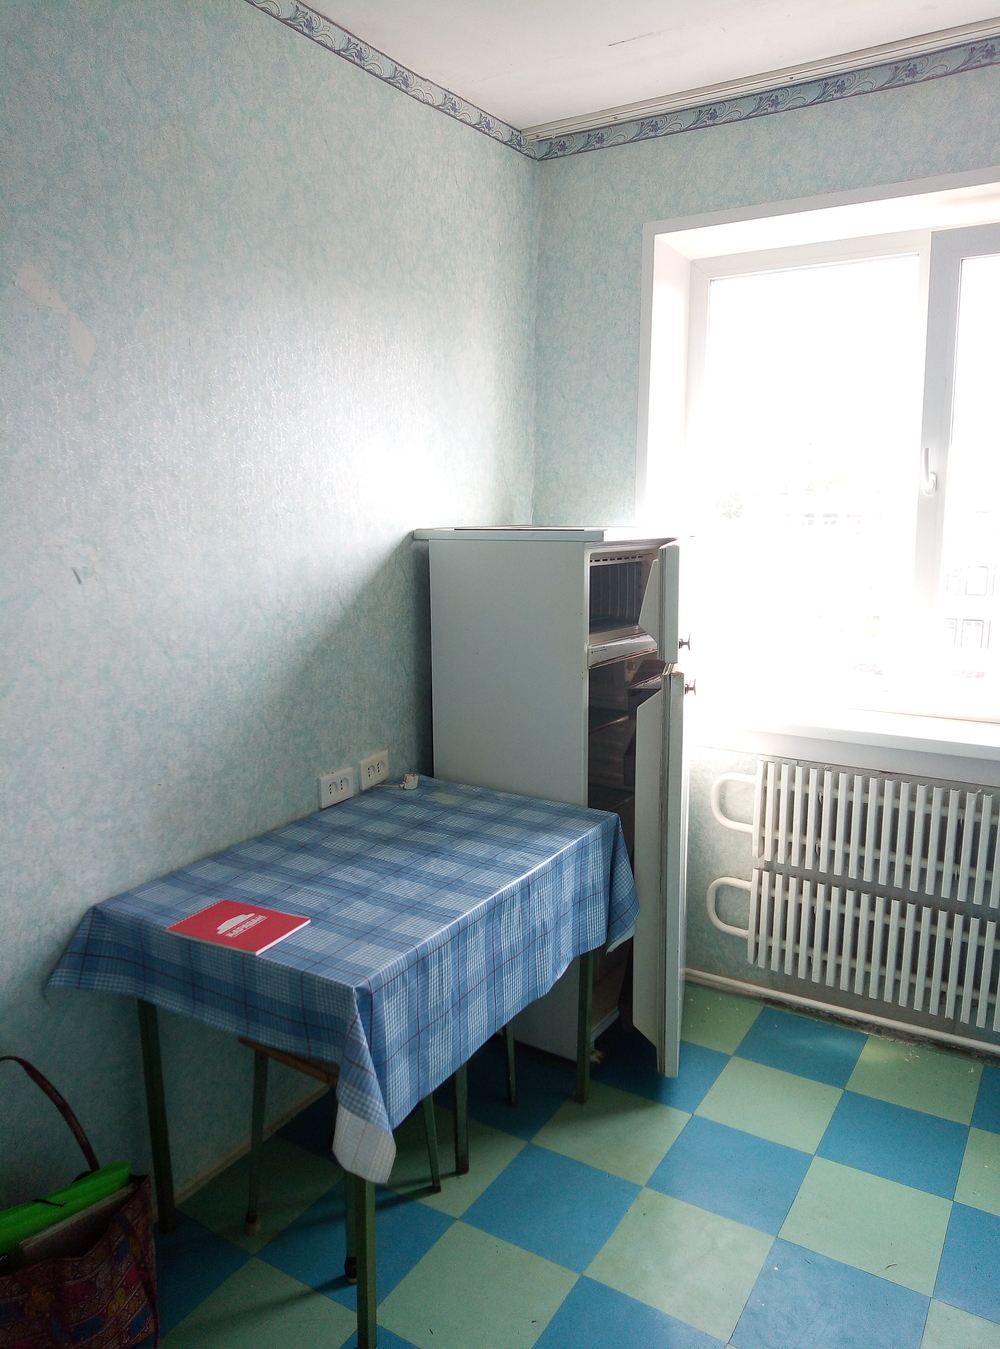 Красноярский край, Сосновоборск, ул. 9 Пятилетки, 26 3